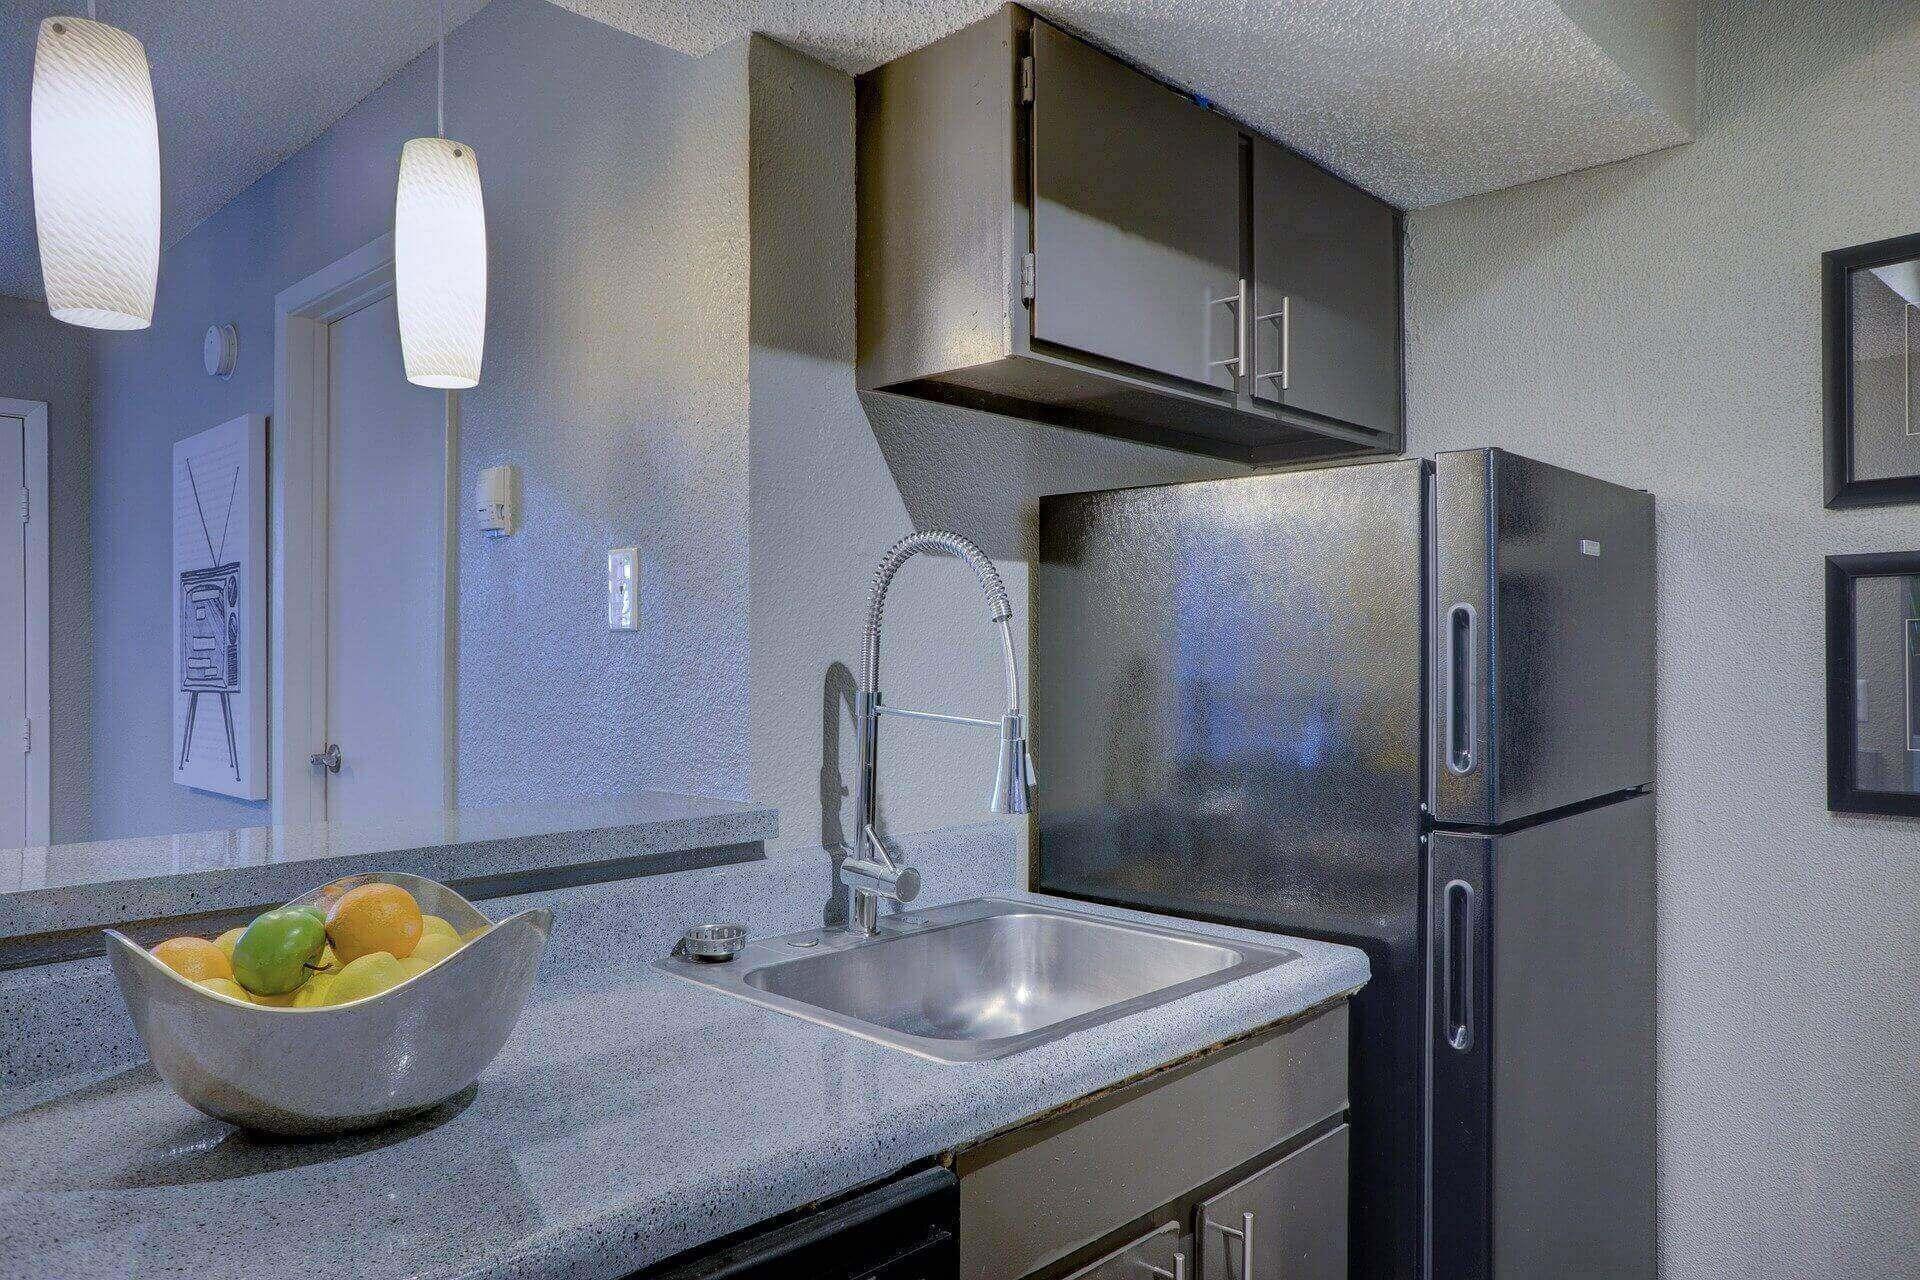 Right location for refrigerator